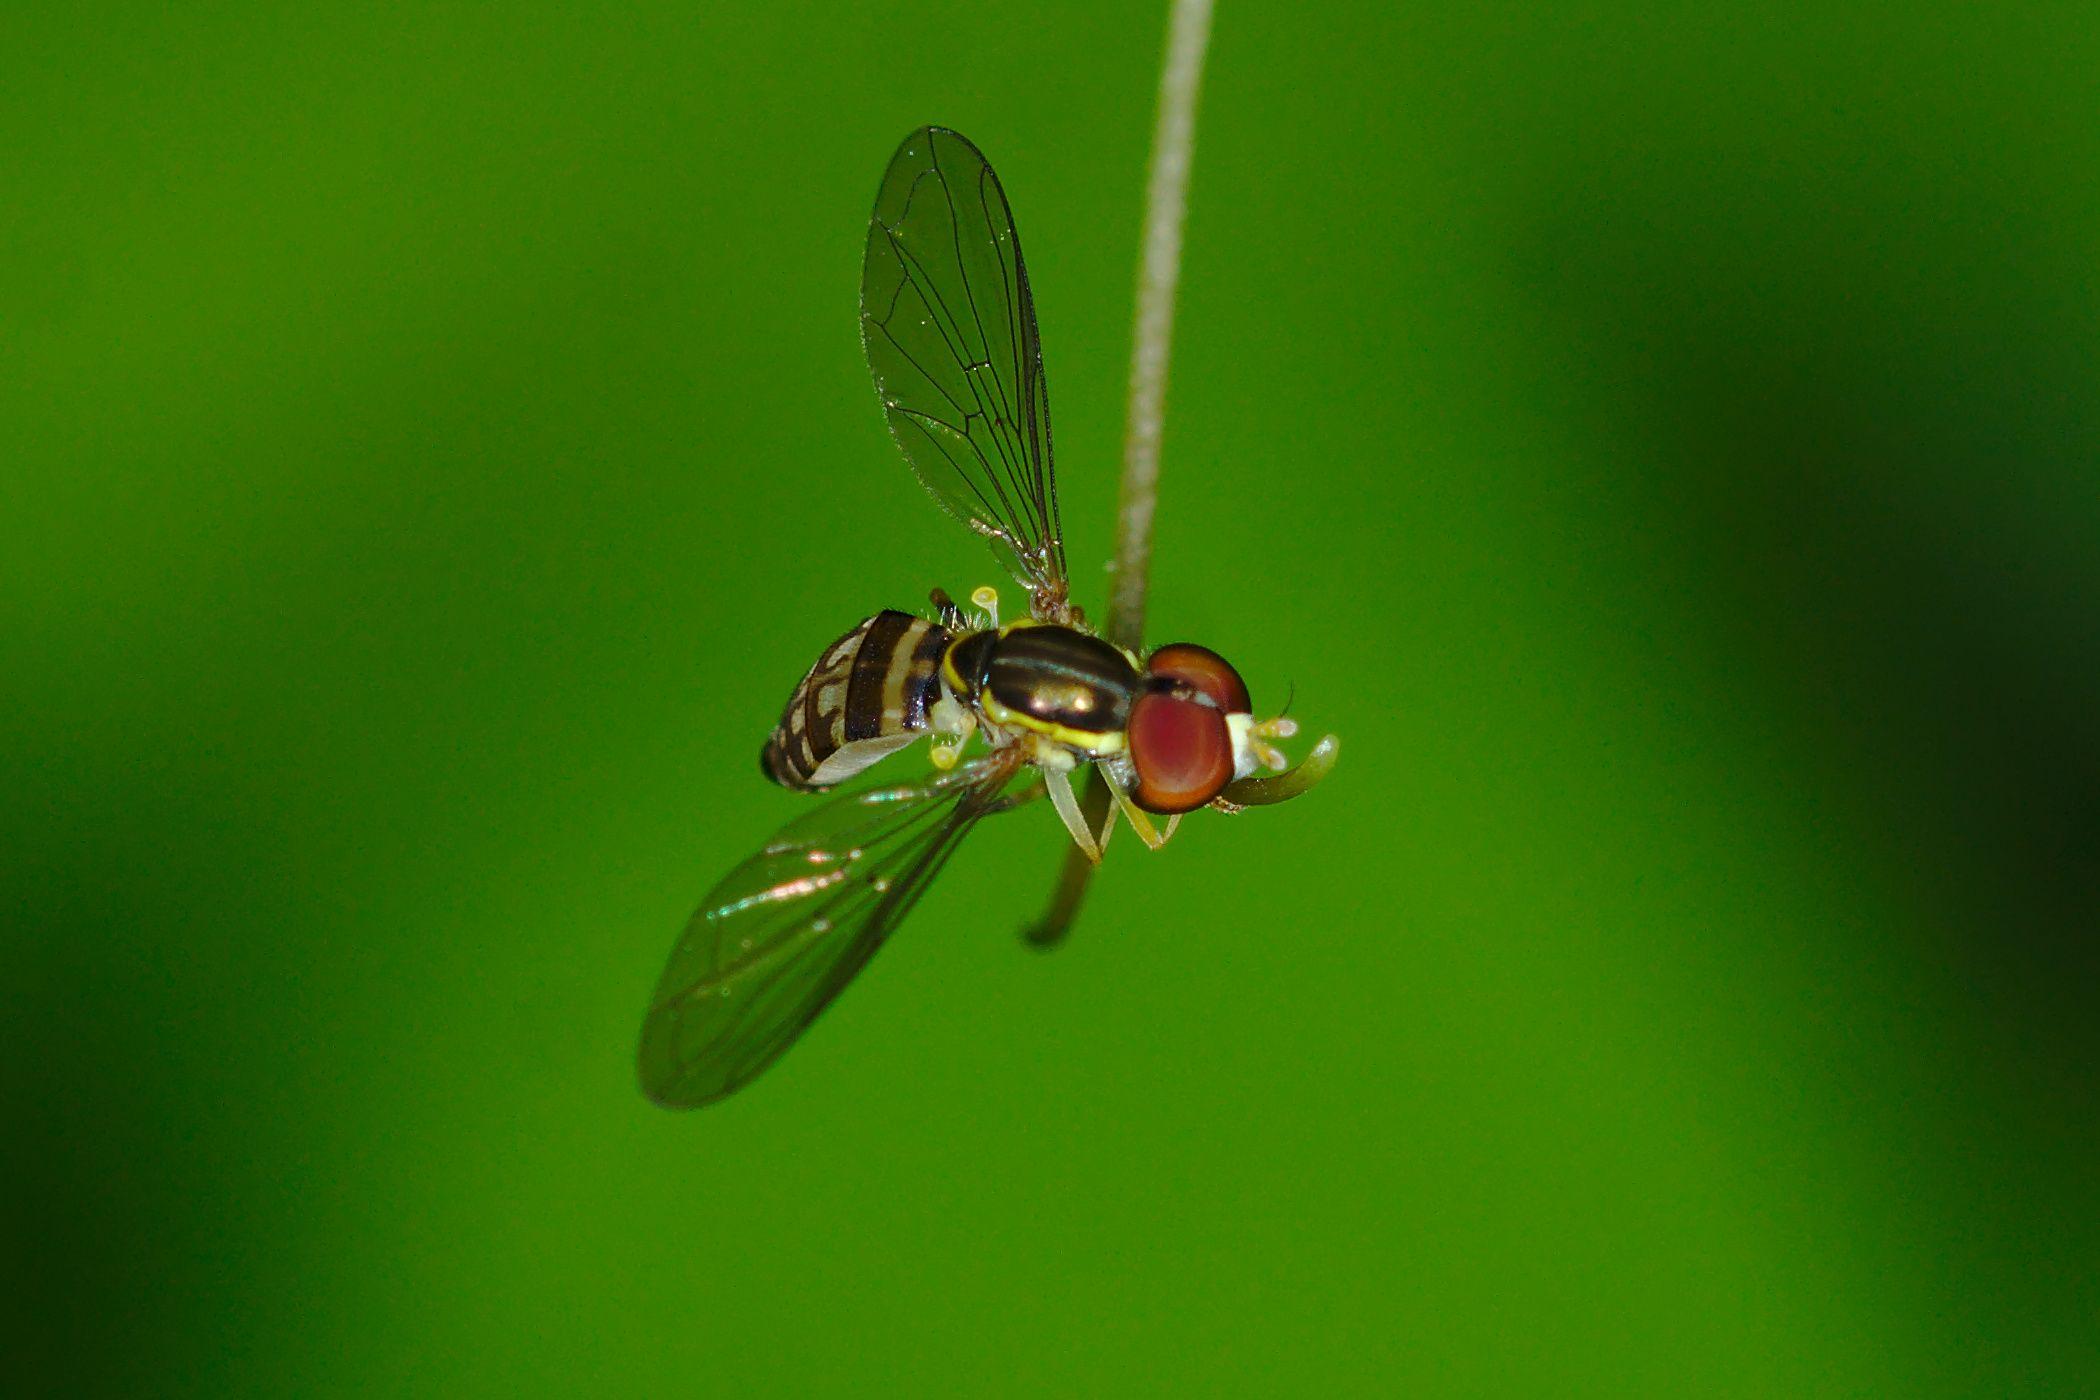 <i>Toxomerus pictus</i> (Schwebfliege)